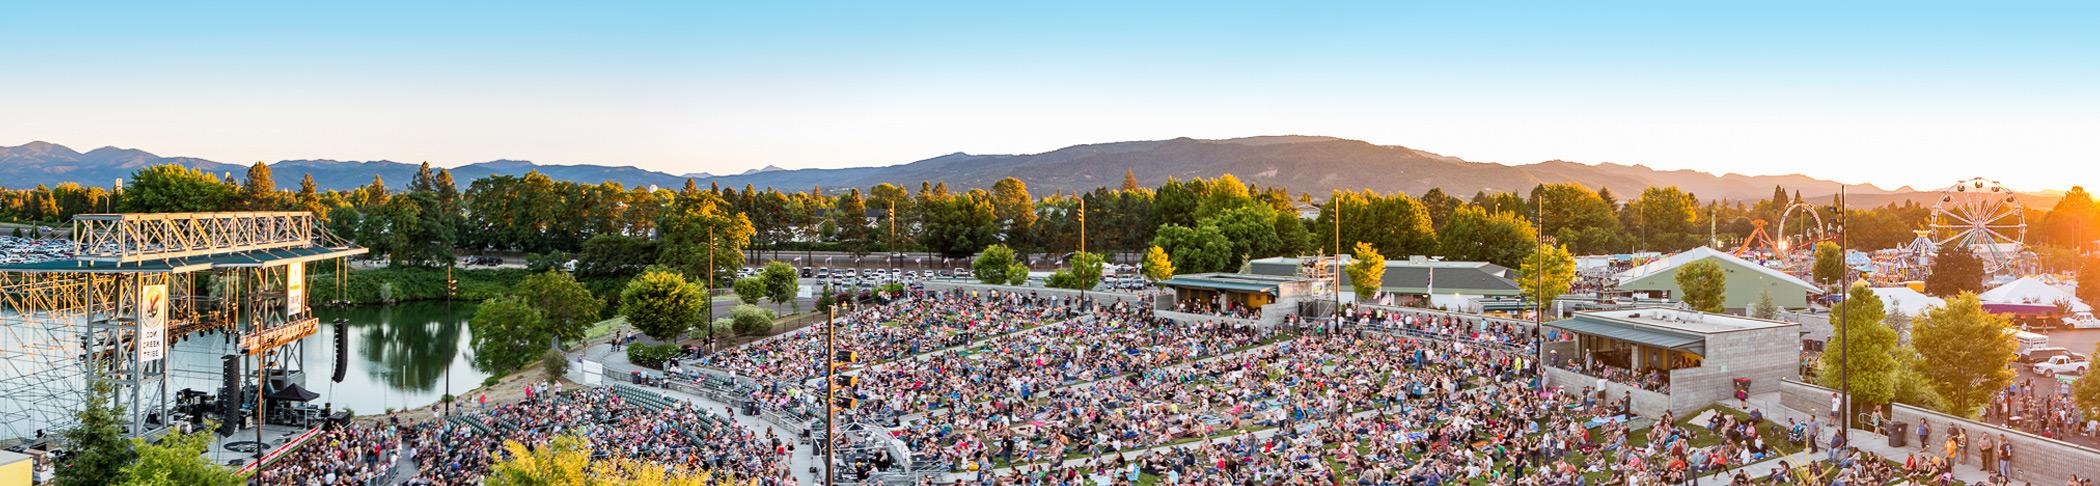 Bi-Mart-Amphitheater-2020